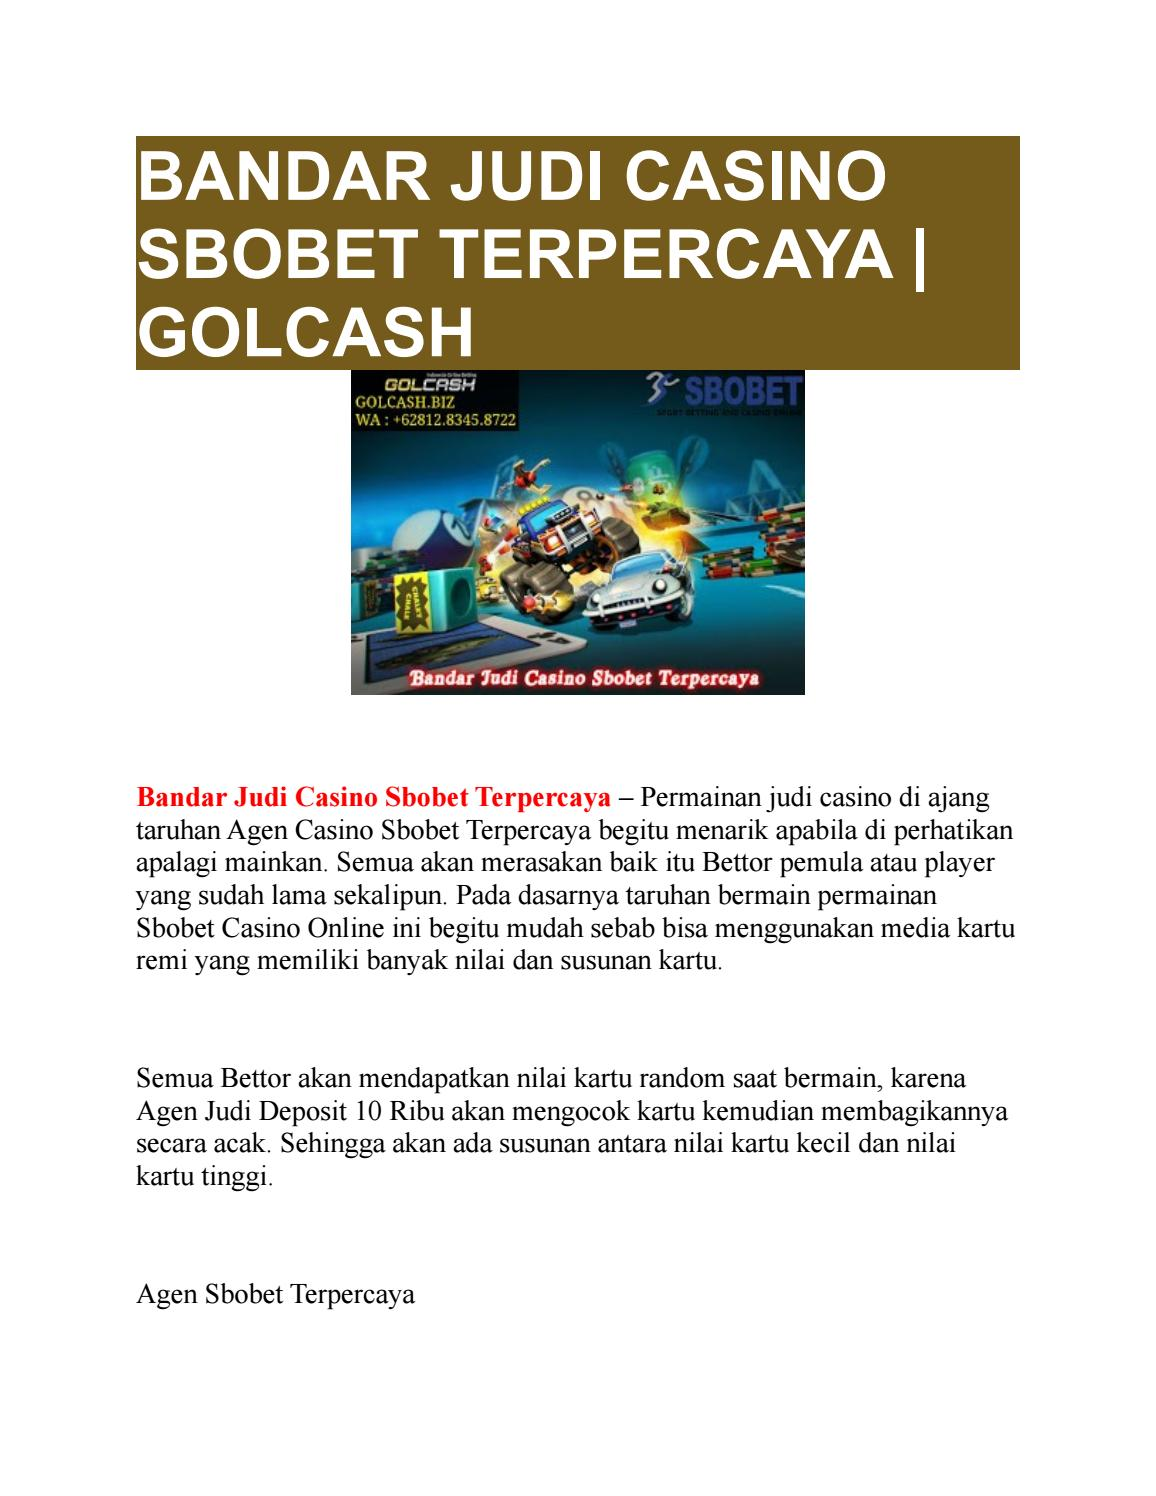 Bandar Judi Casino Sbobet Terpercaya Golcash By Golcash Issuu